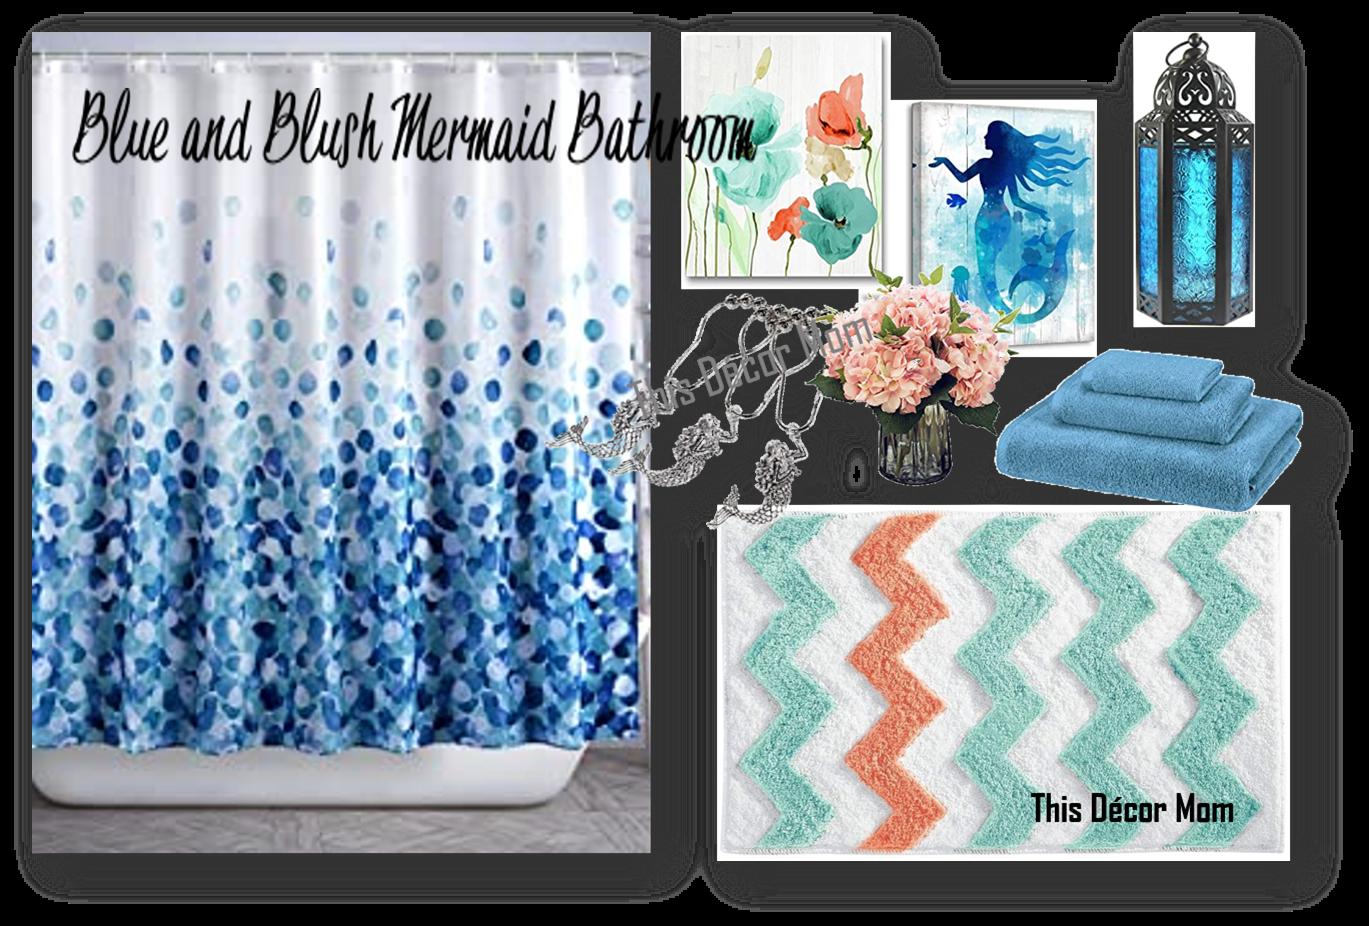 Blue and Blush Mermaid Bathroom